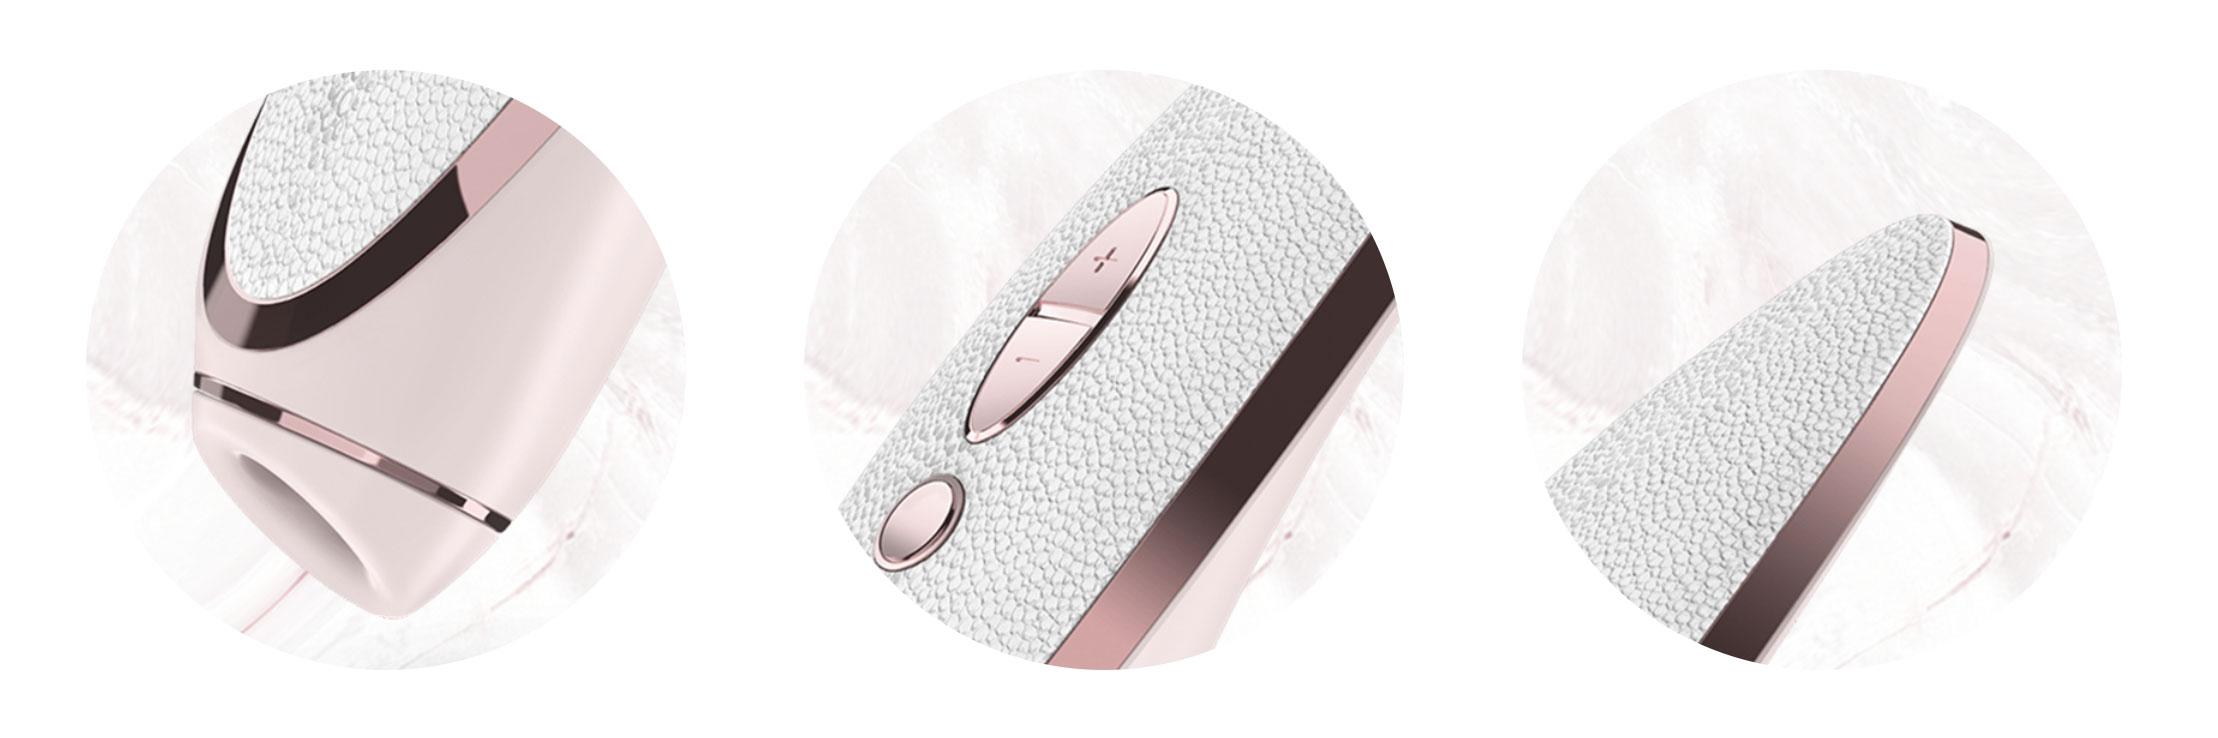 Satisfyer Luxury Pret-a-Porter